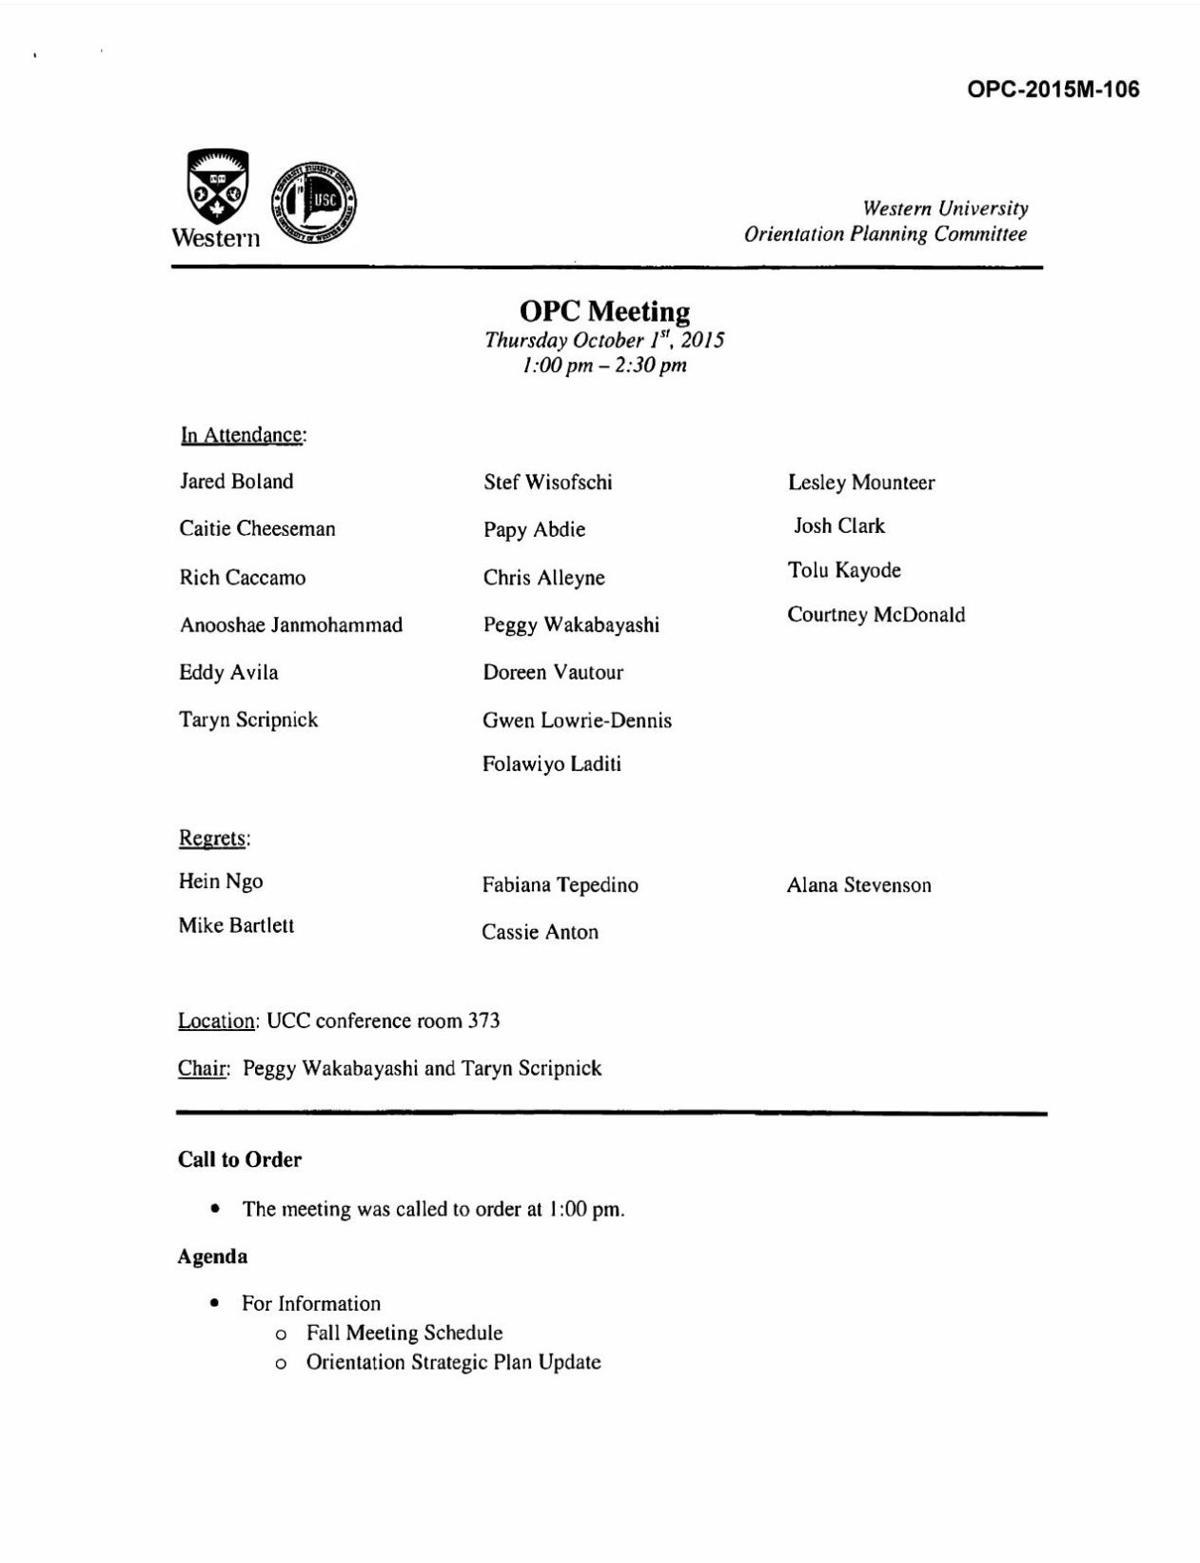 OPC Meeting - October 1, 2015.pdf